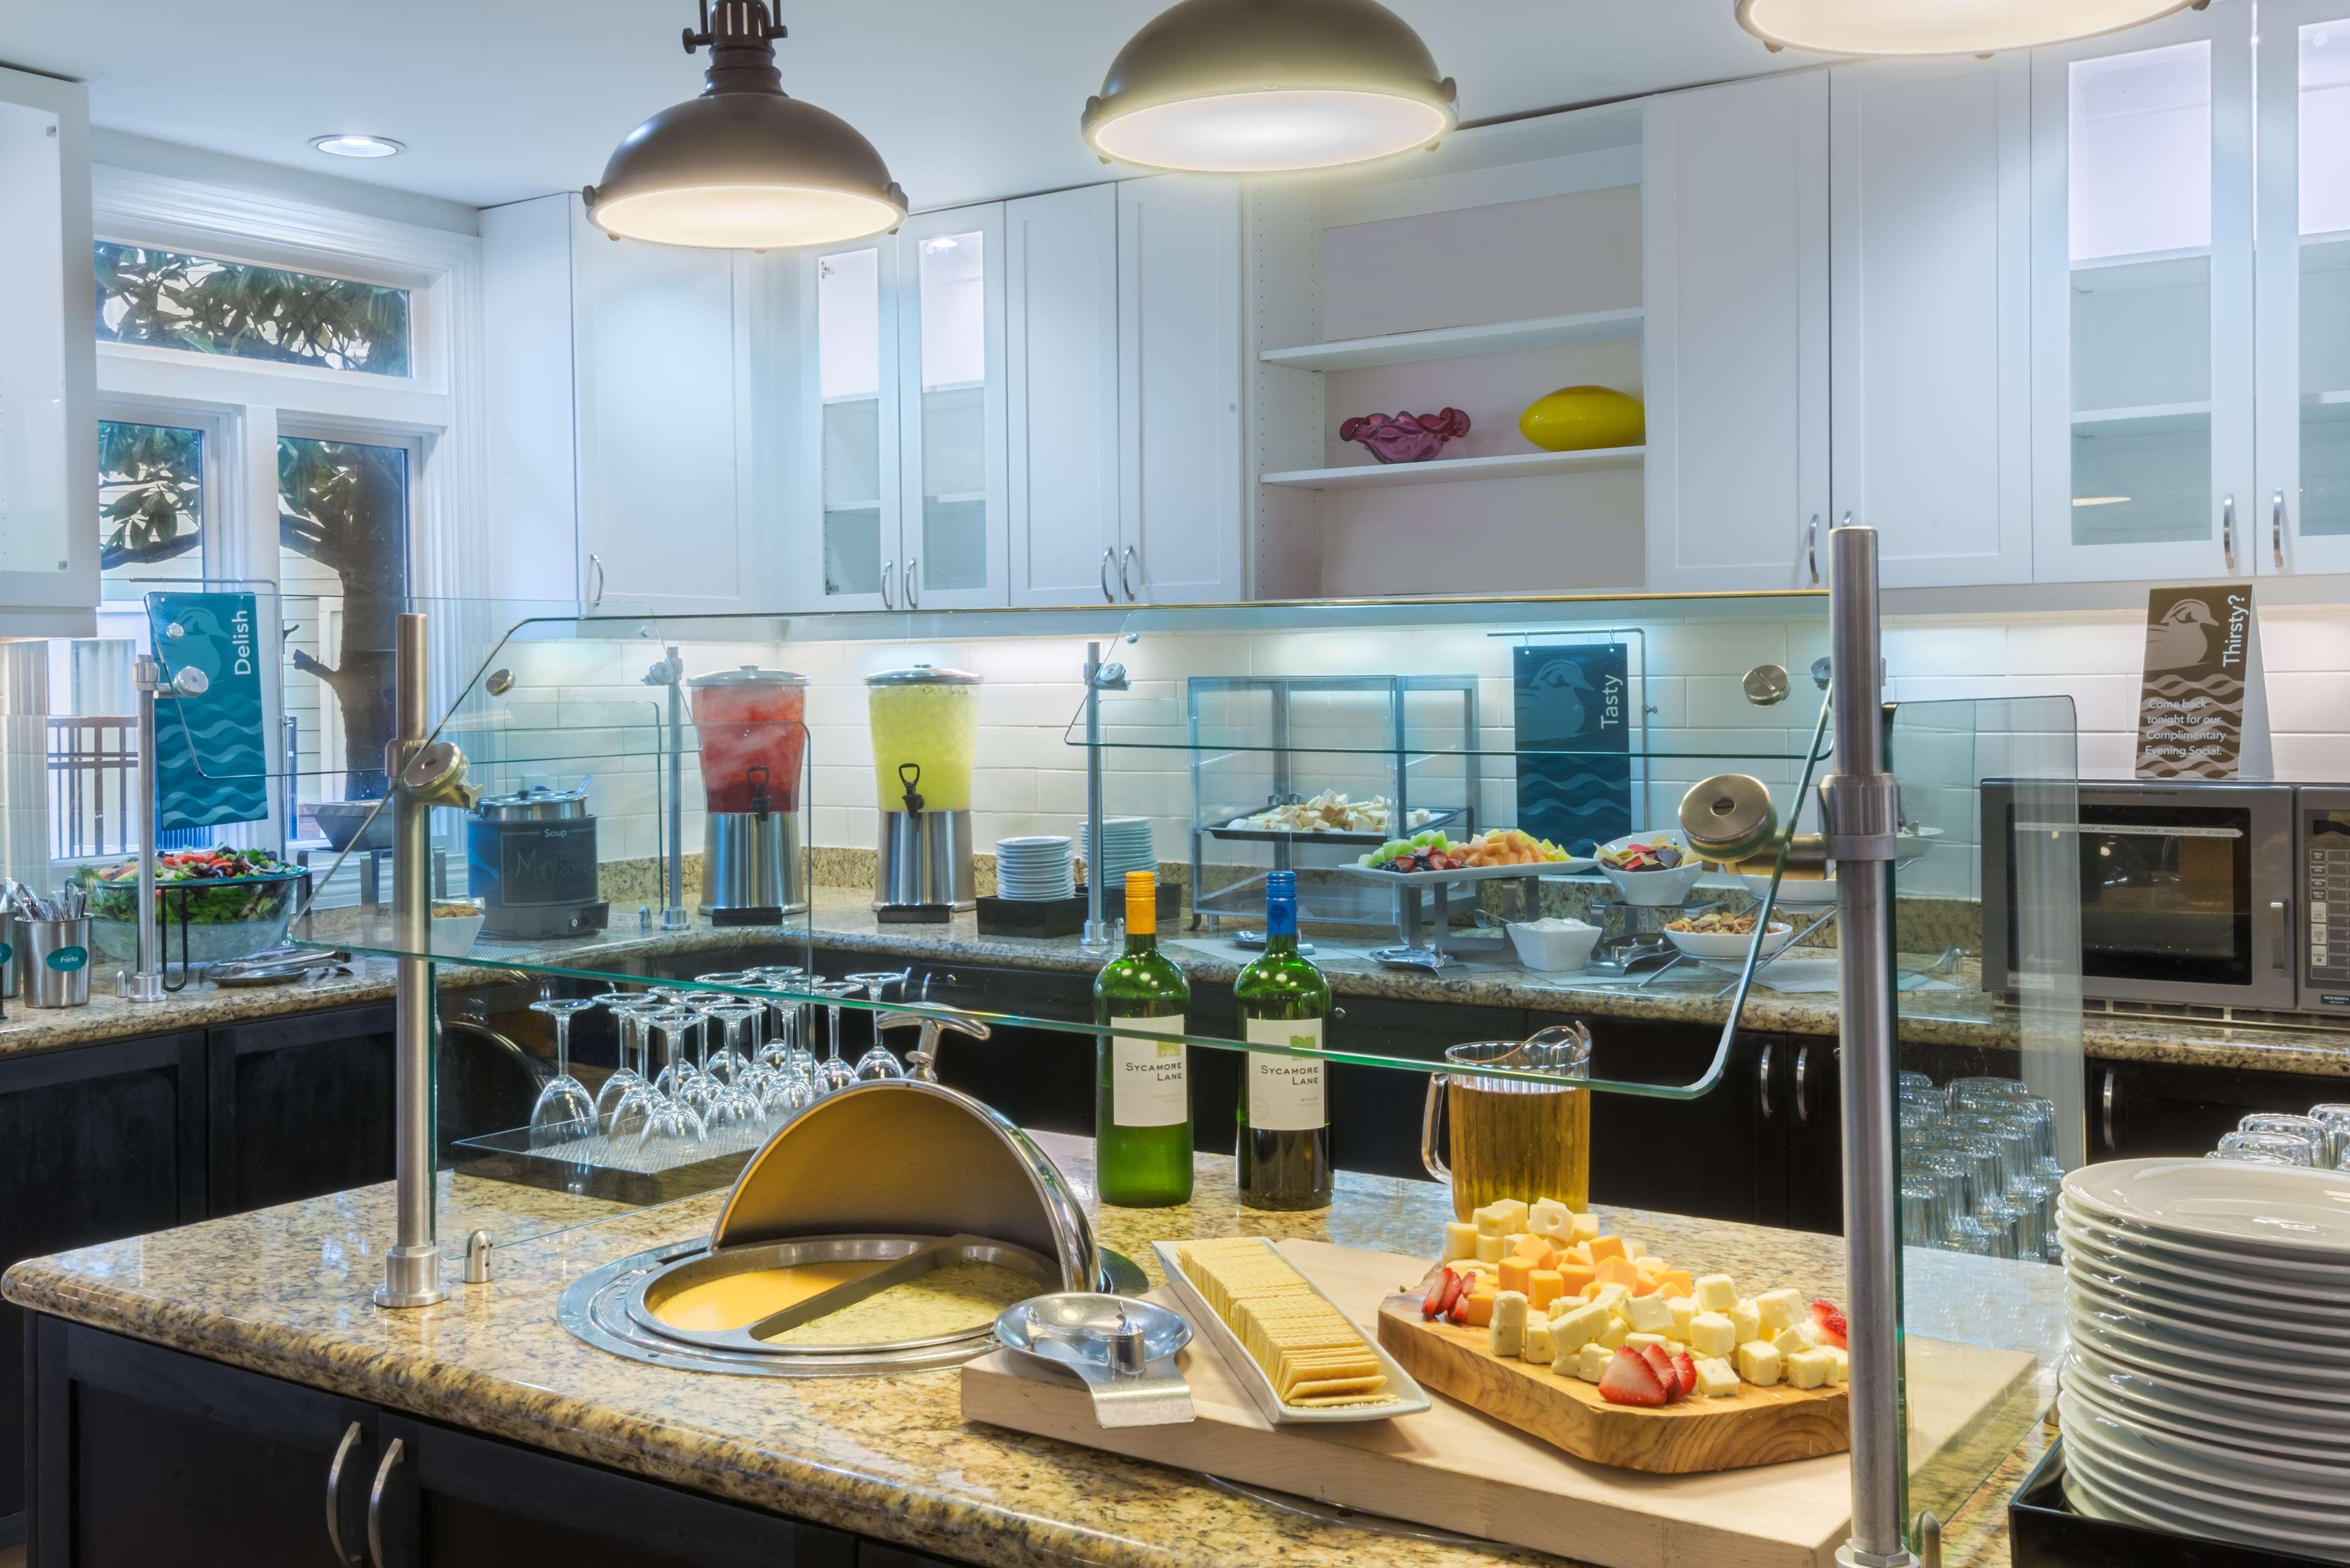 Homewood Suites by Hilton Charlotte-North/Univ Research Park image 7